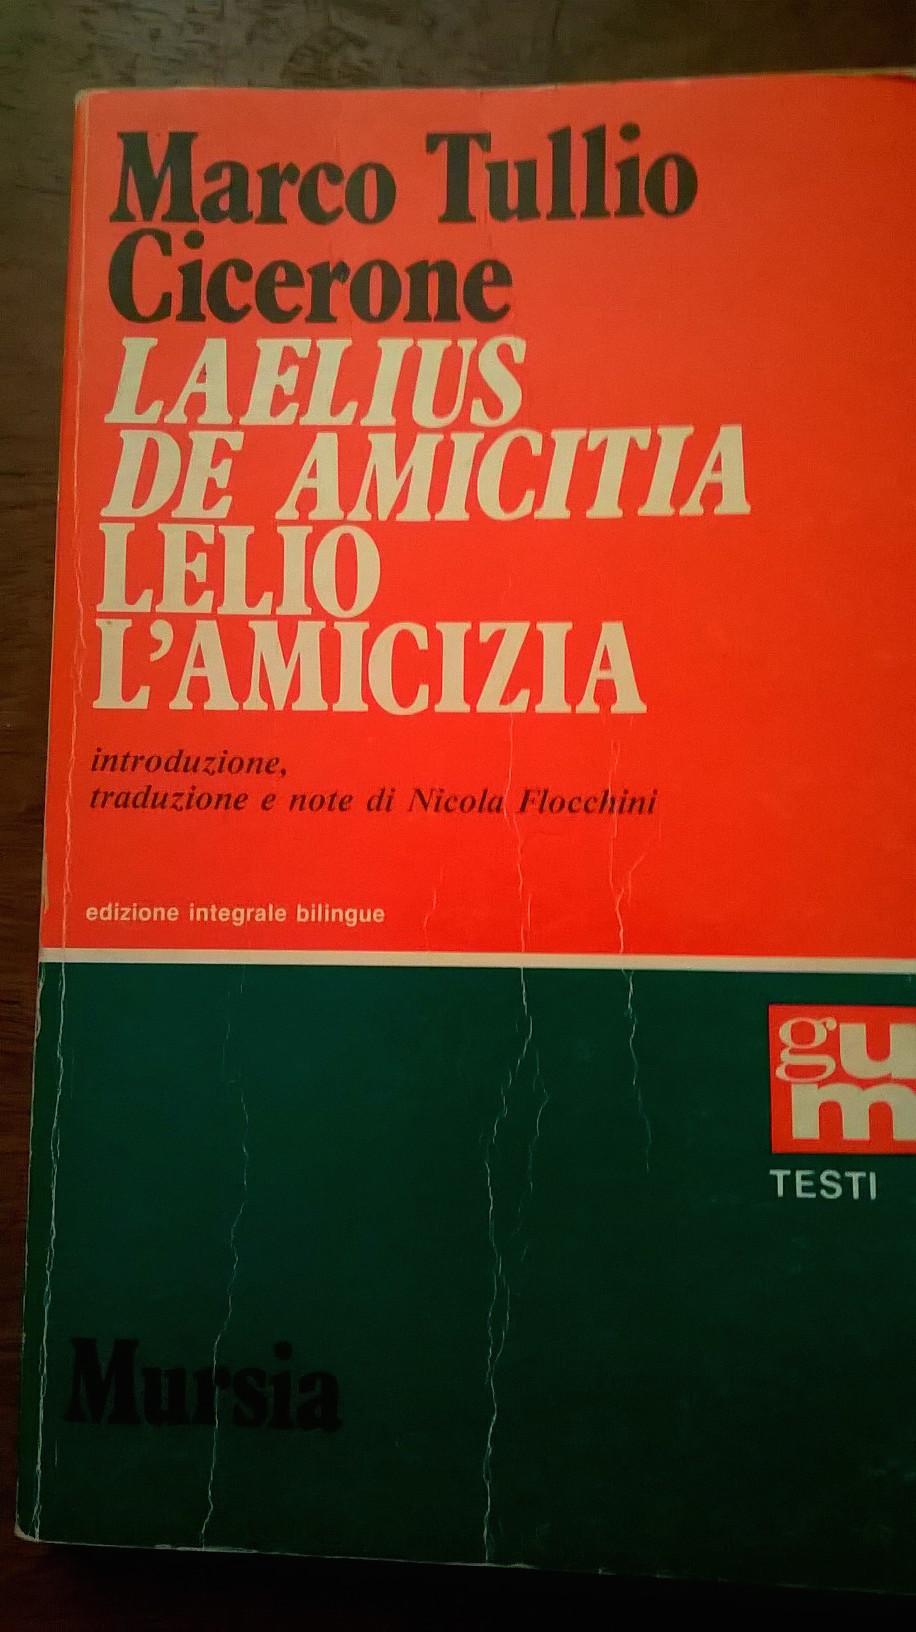 Laelius de amicitia / Lelio, l'amicizia